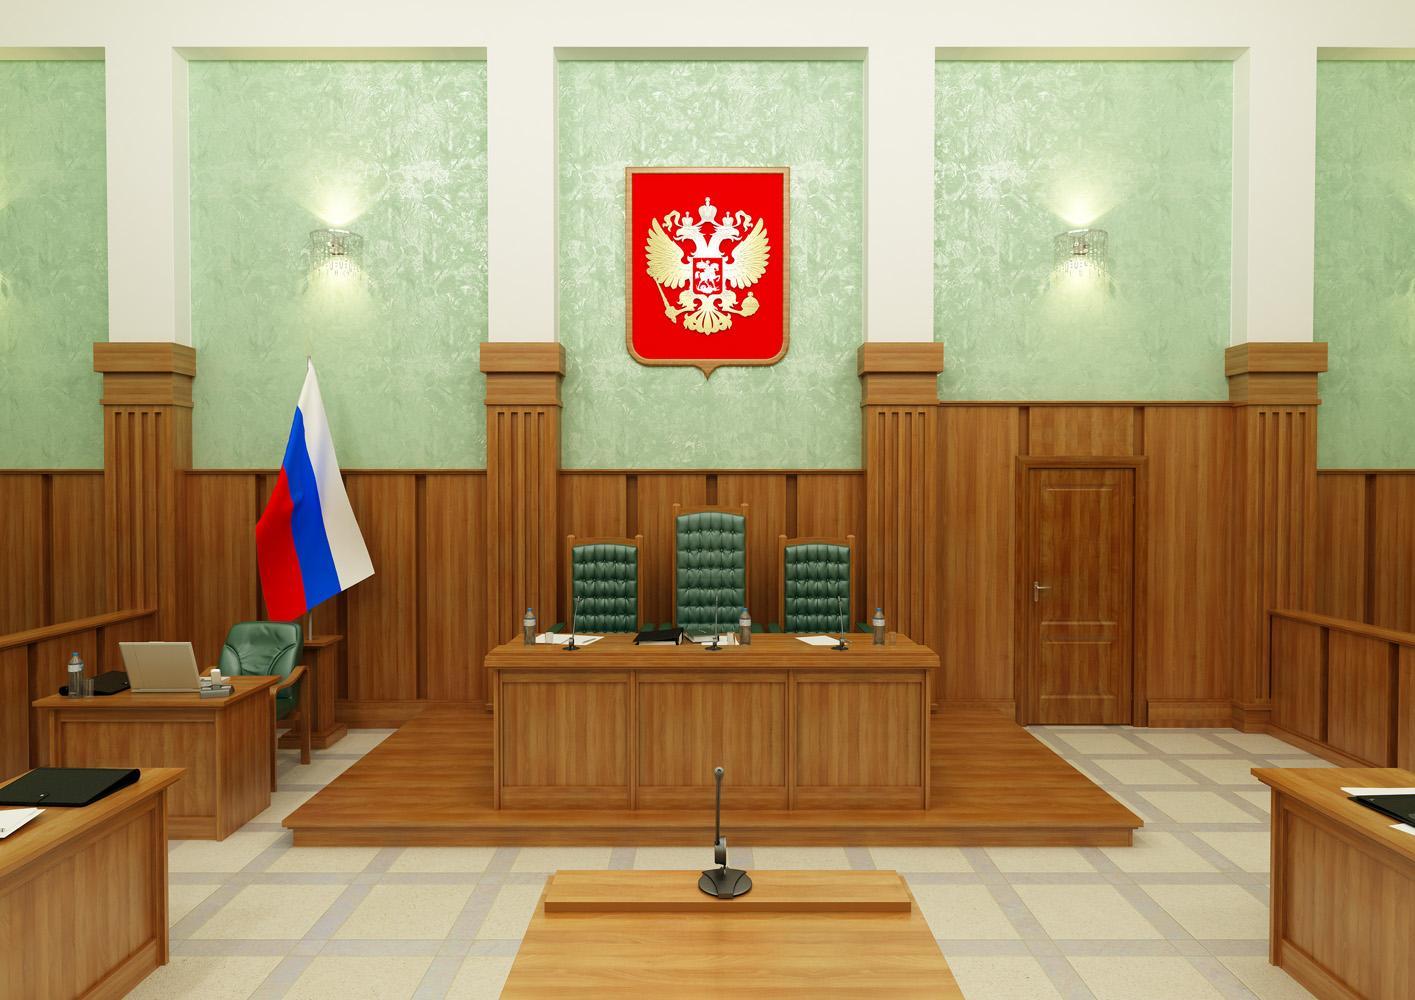 Омича арестовали запост в соц. сети